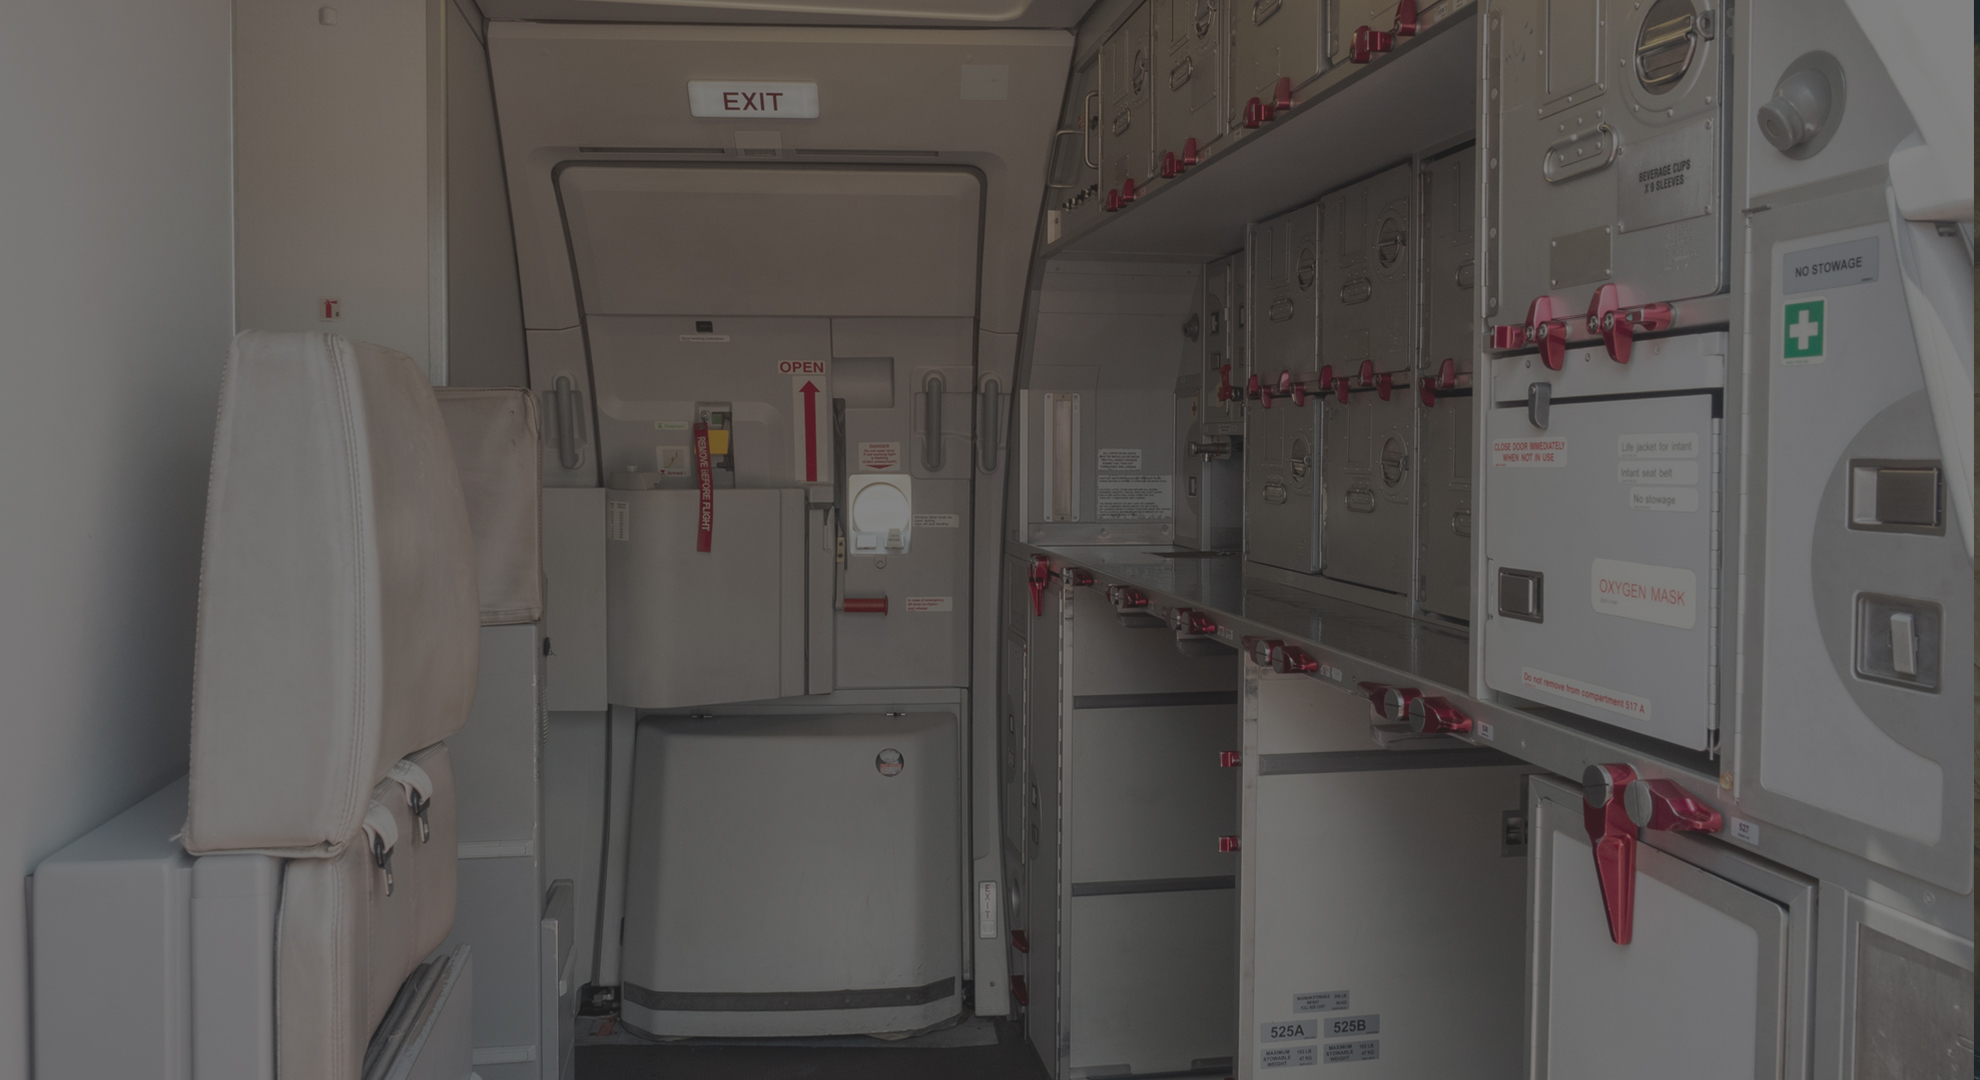 AIRA Interior Spare Parts Galley